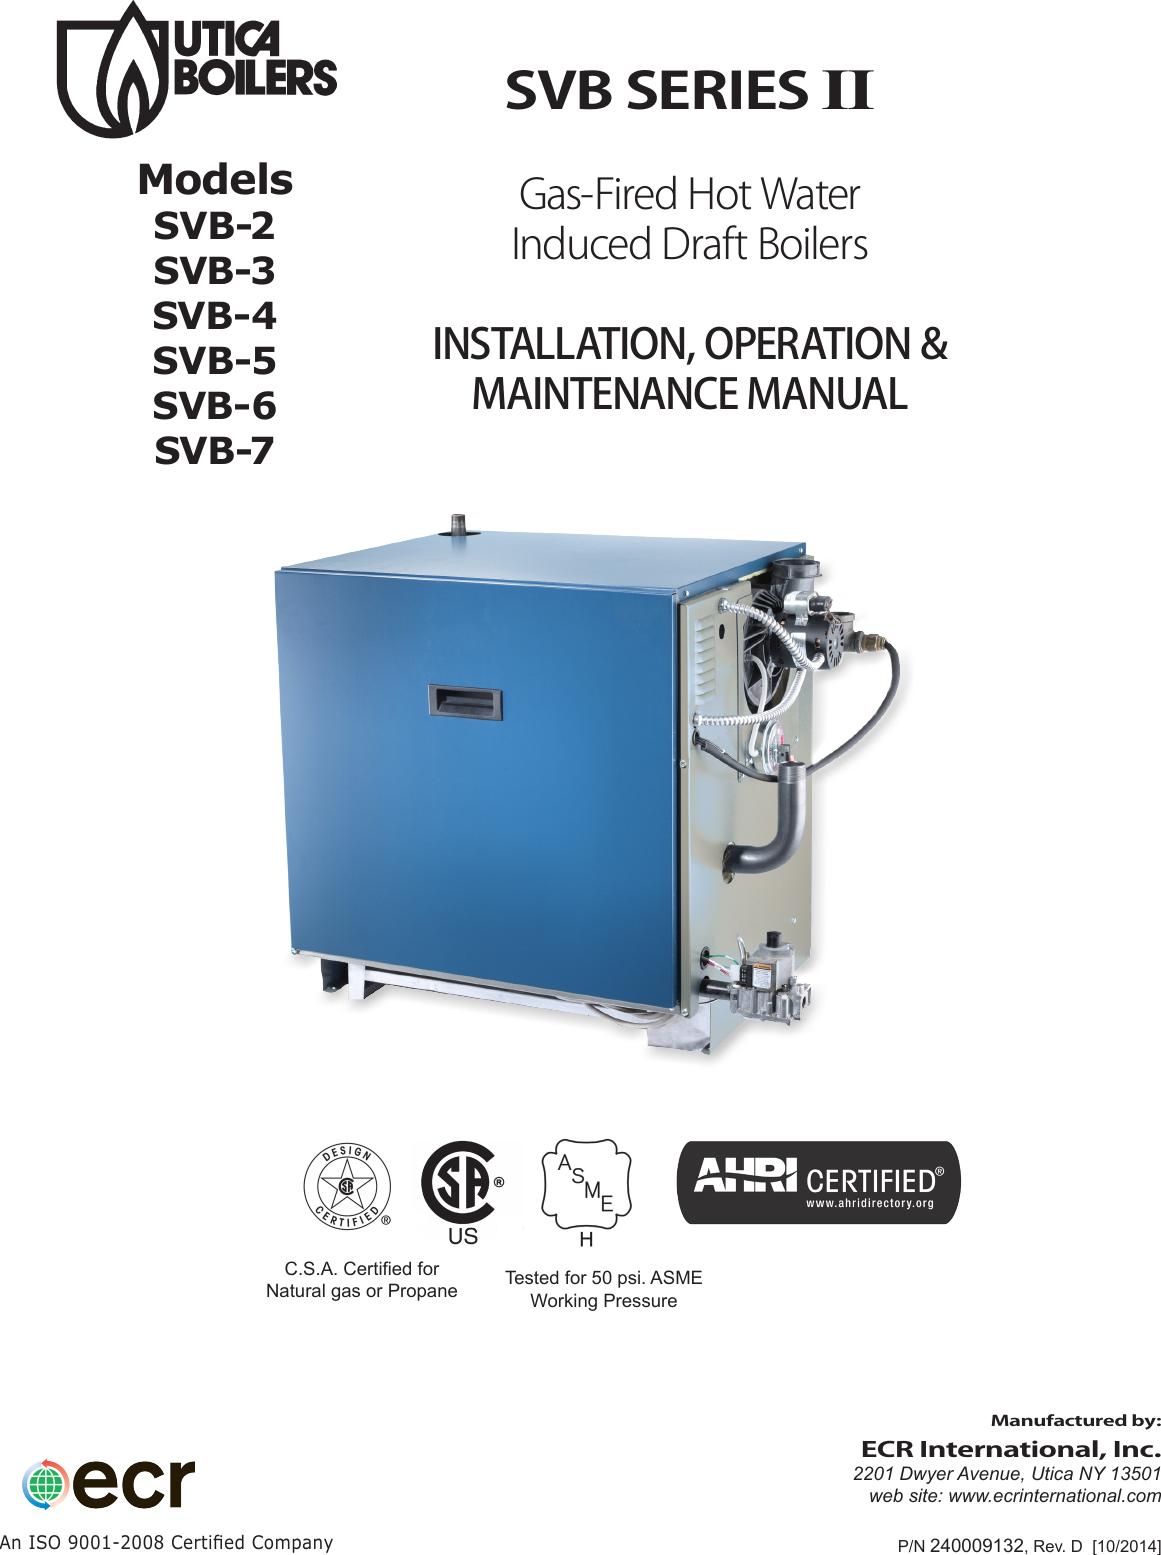 Utica Boilers Svb Series Ii Operation And Installation Manual